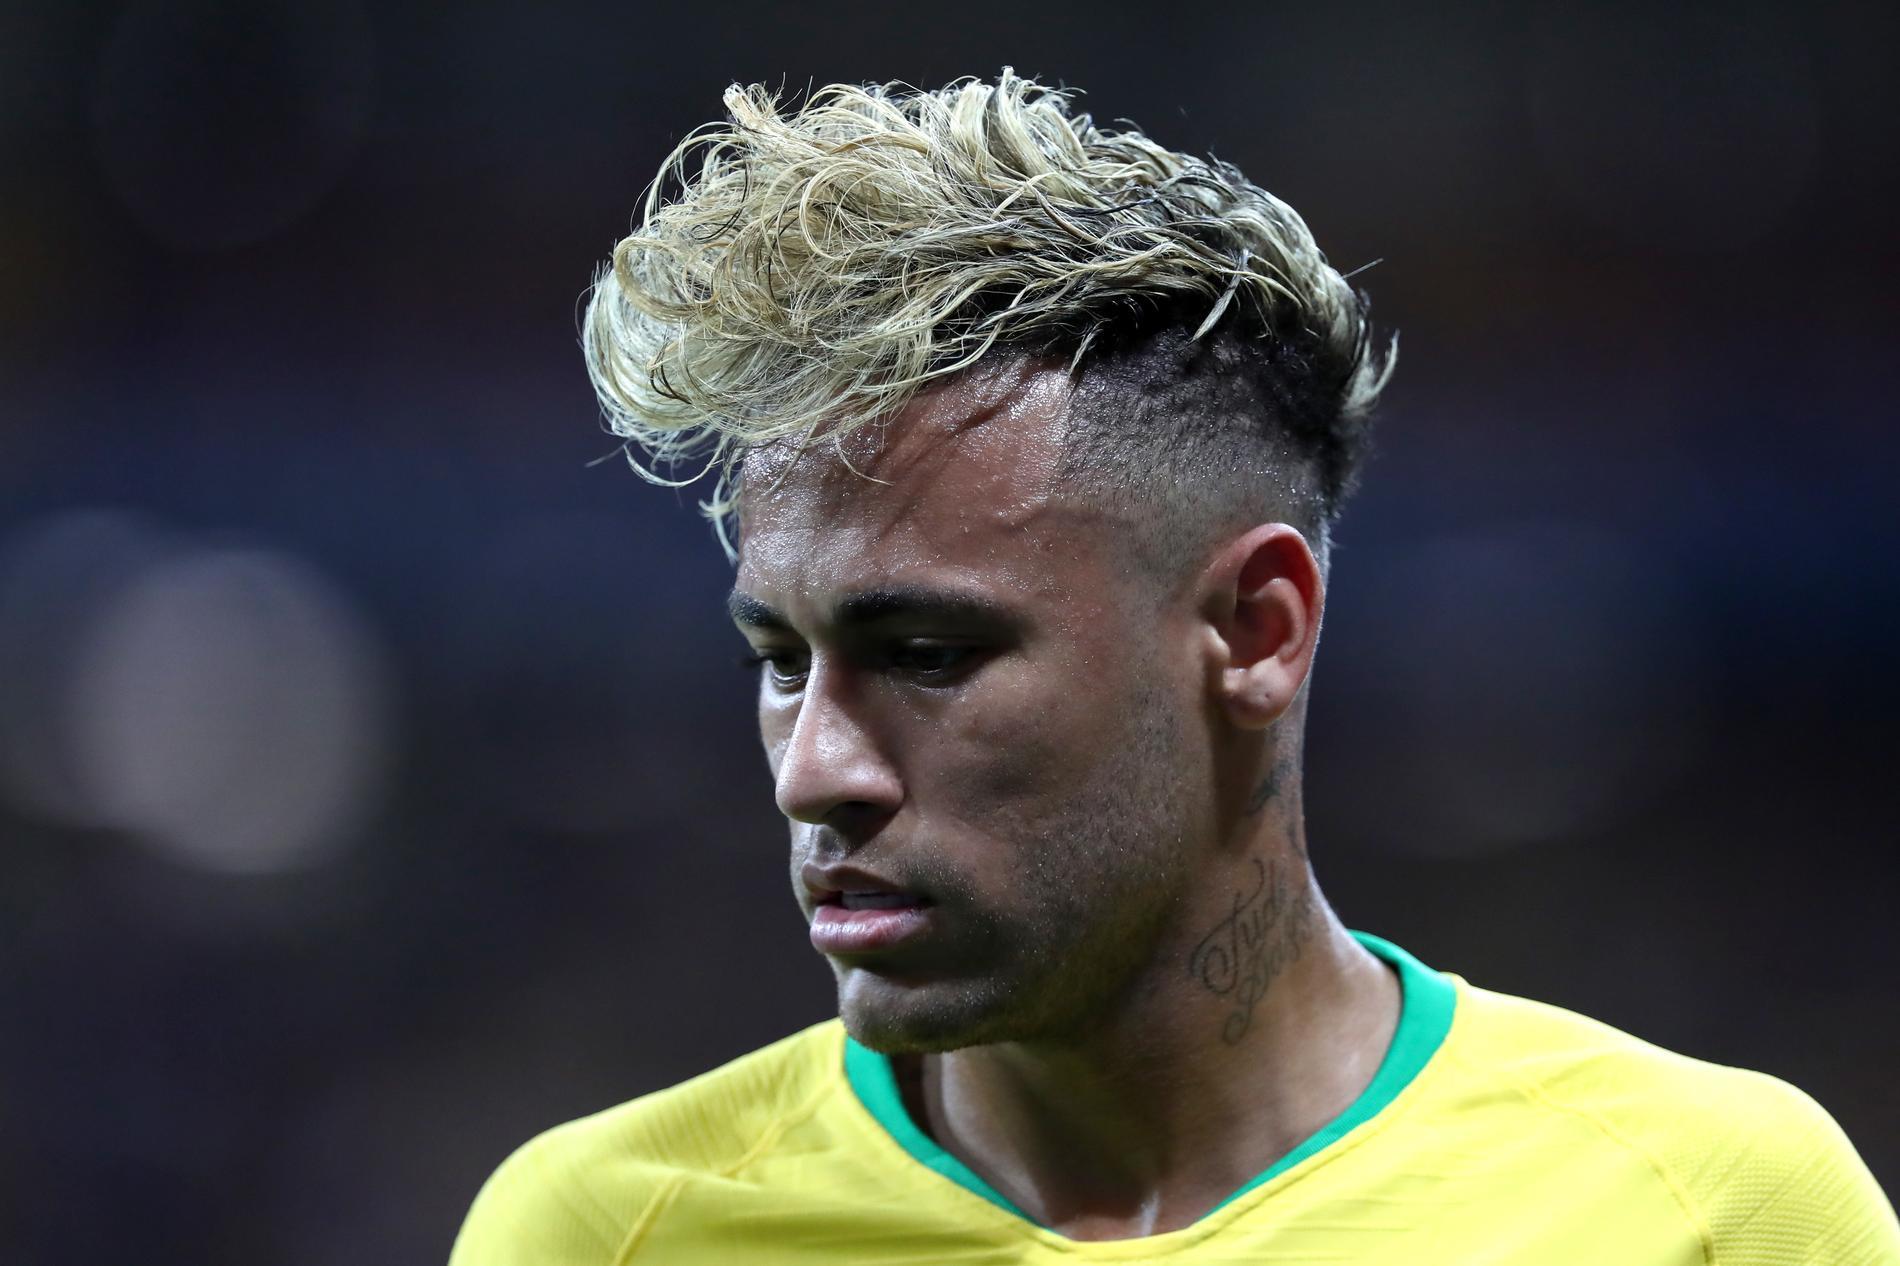 Non Les Coiffures De Neymar Ne Sont Pas Ridicules Madame Figaro